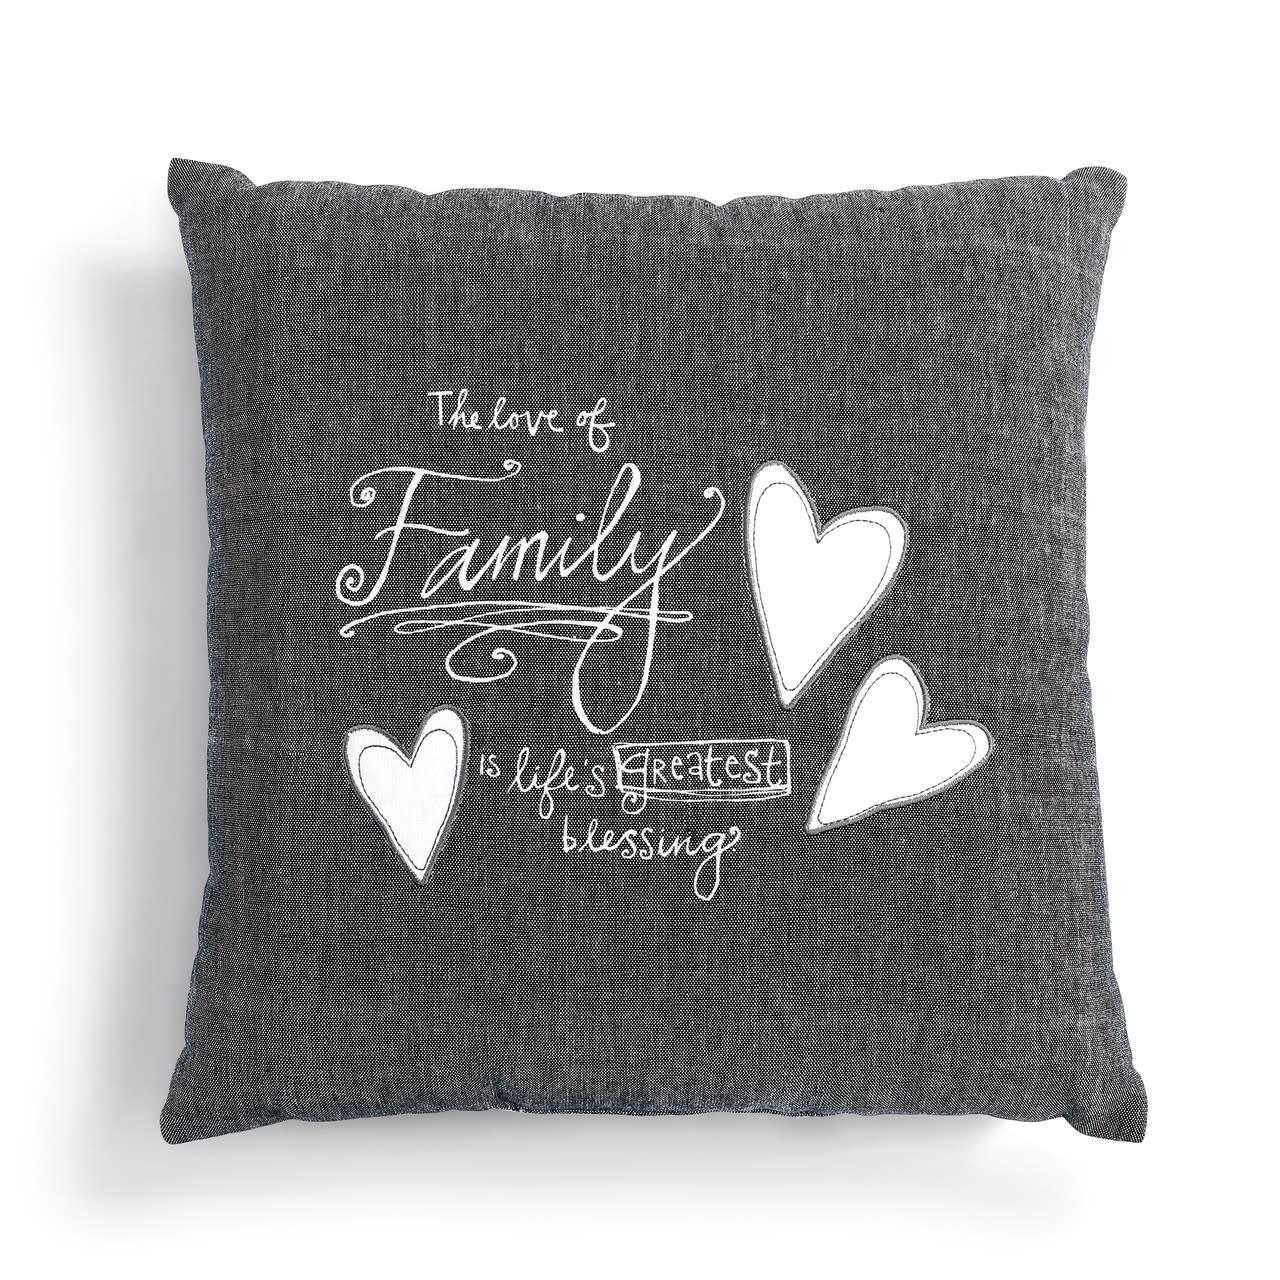 Lori Seibert Love of Family Pillow